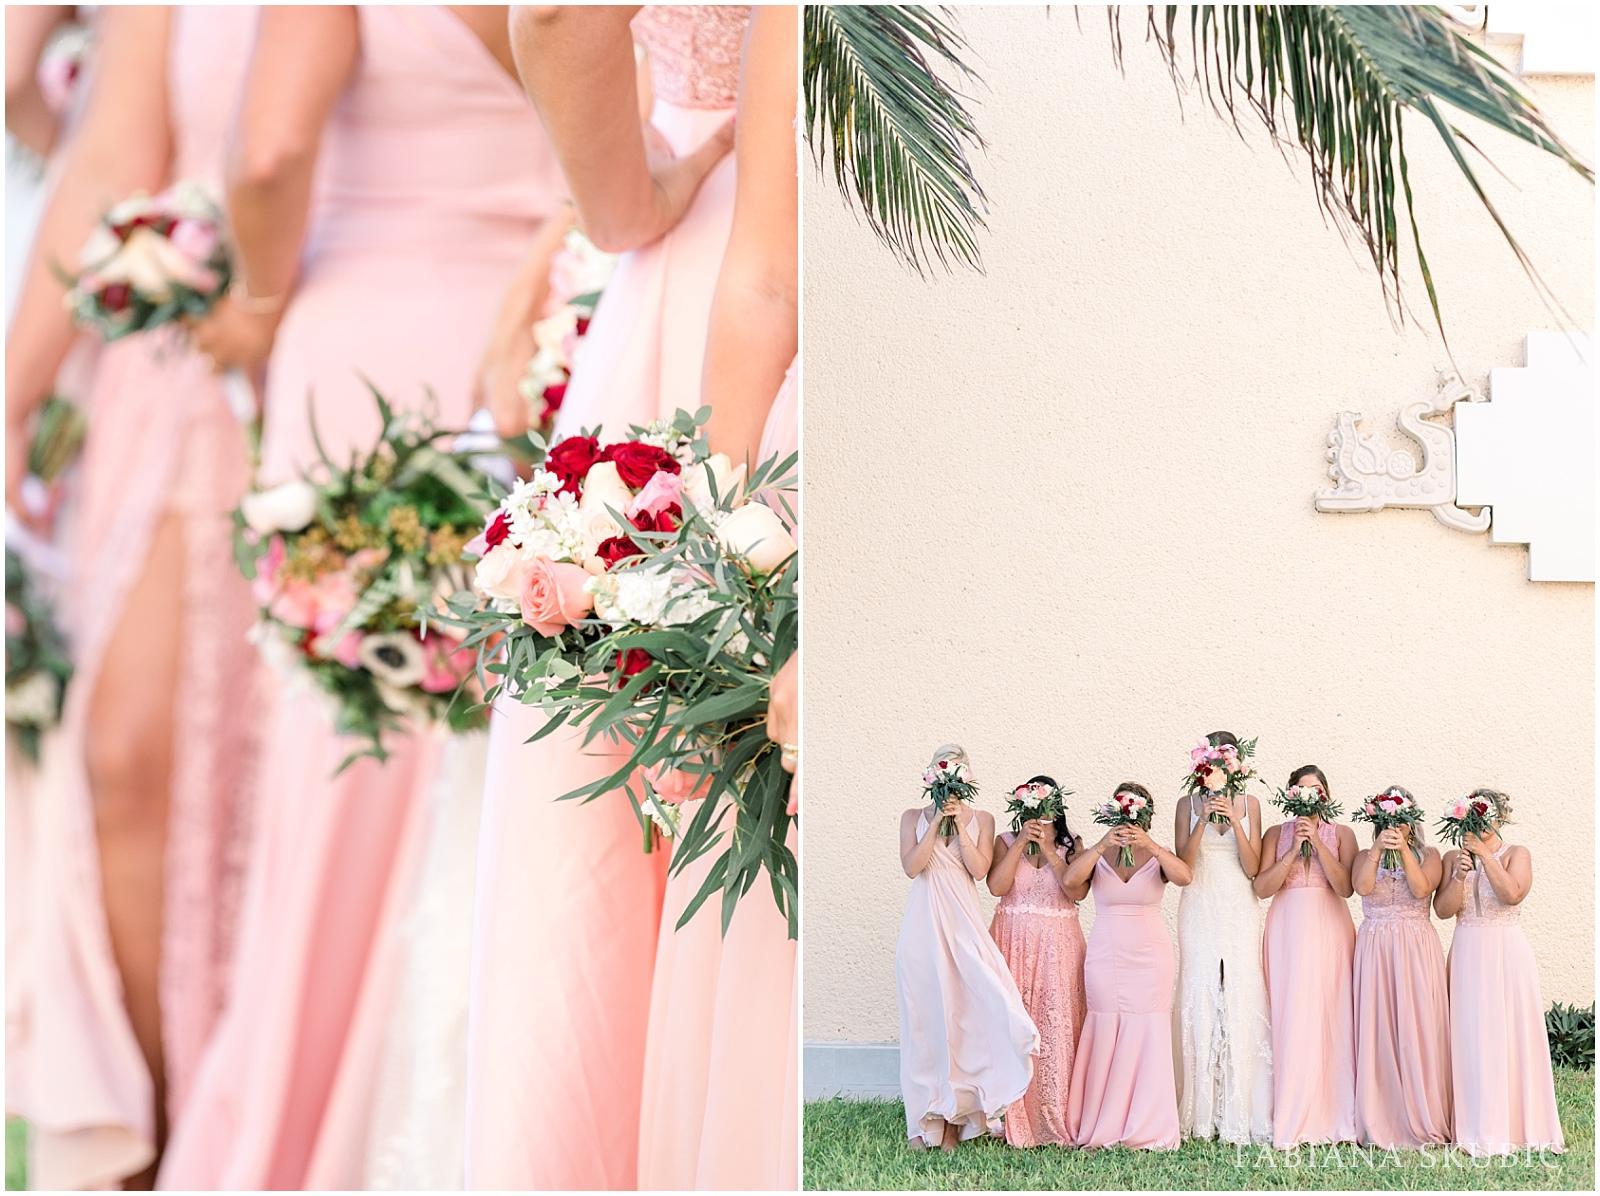 TJ_Now_Sapphire_Riviera_Cancun_Mexico_Wedding_Photos_0212.jpg